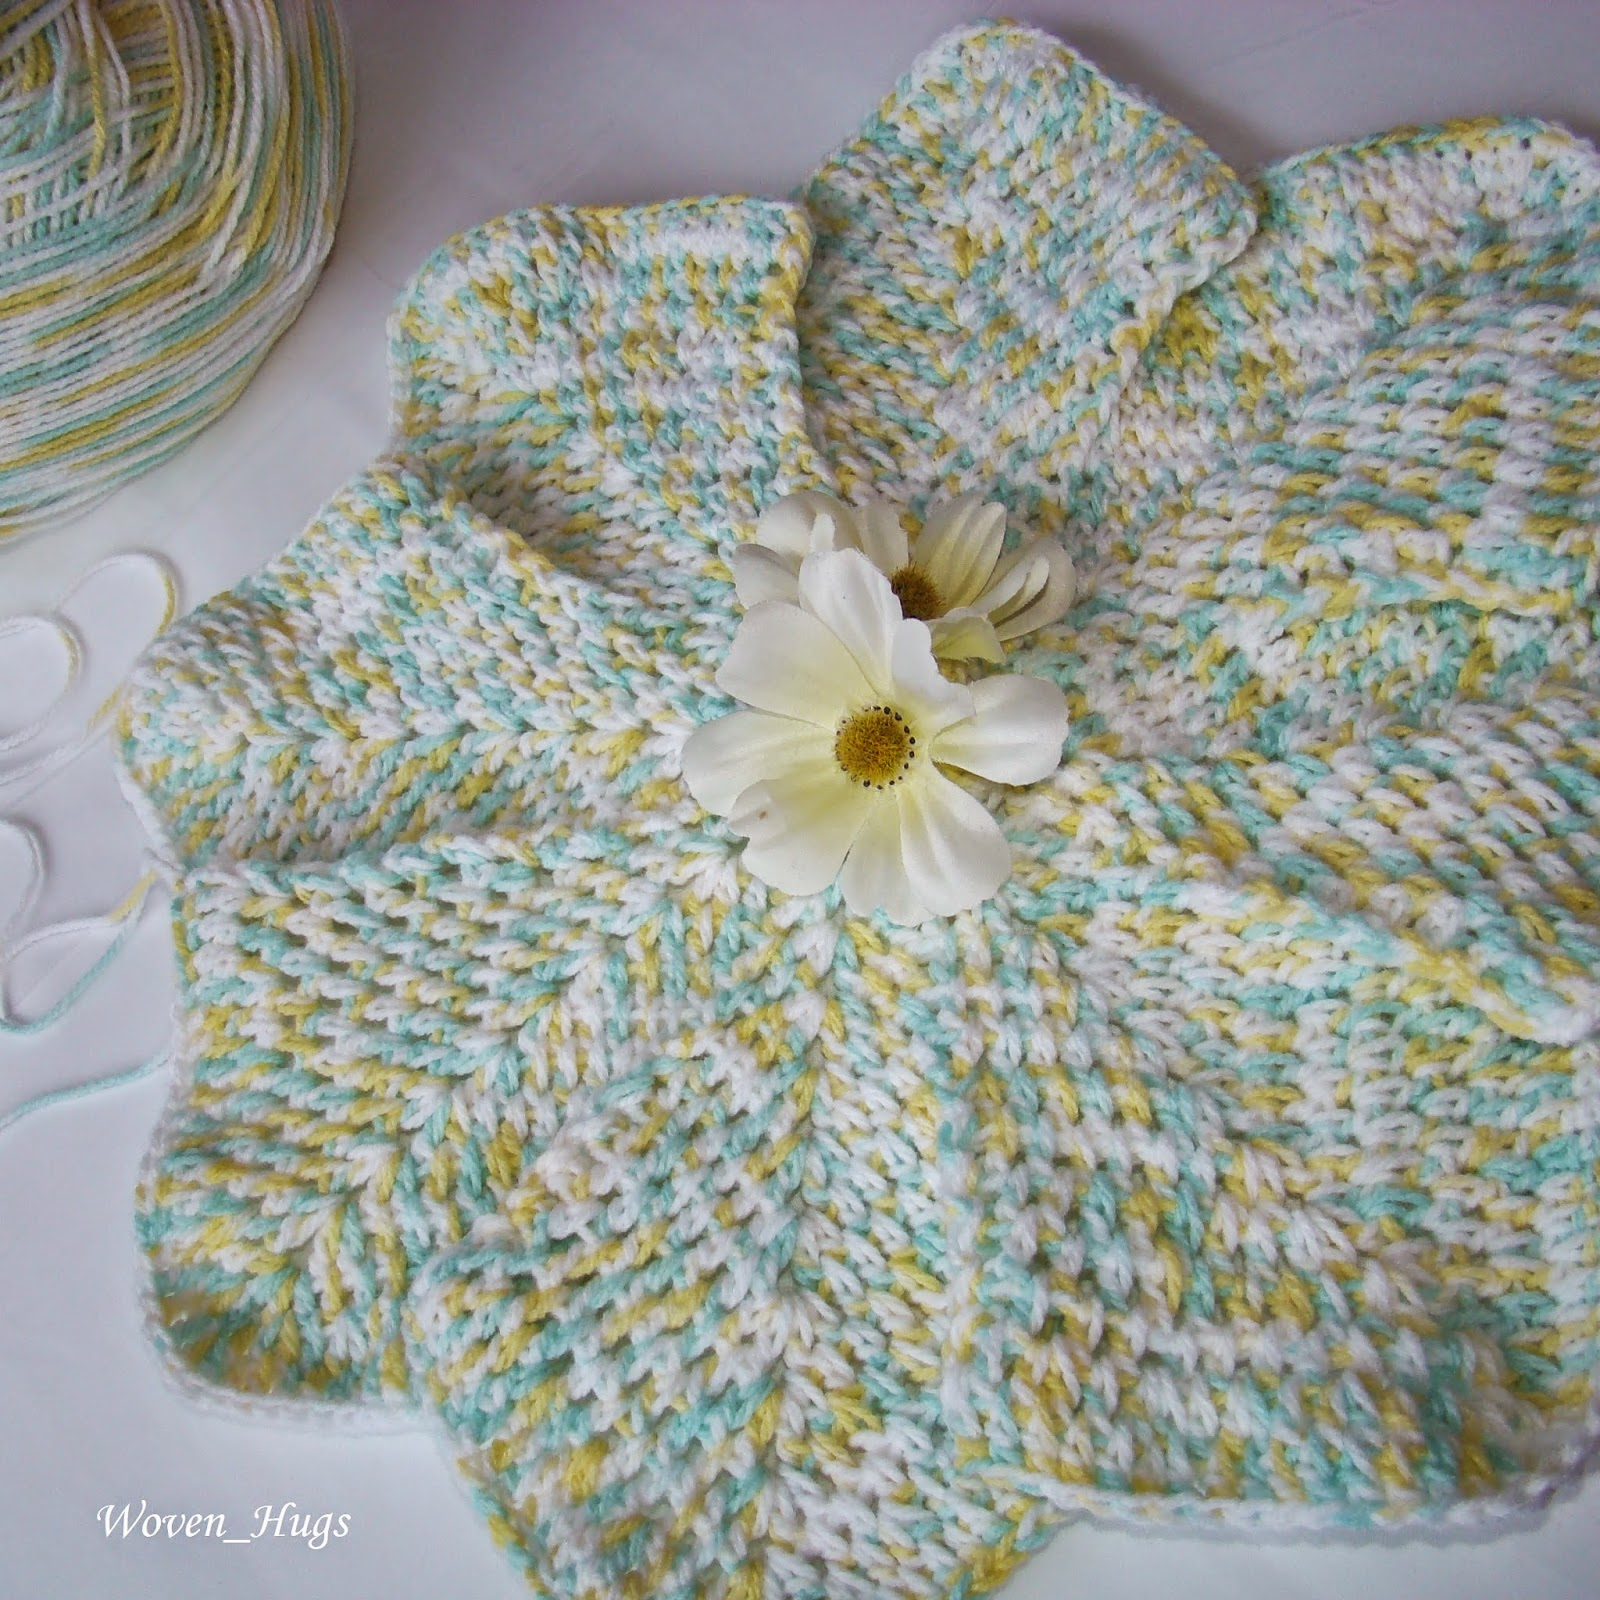 Amigurumi Baby Blanket crochet Pattern